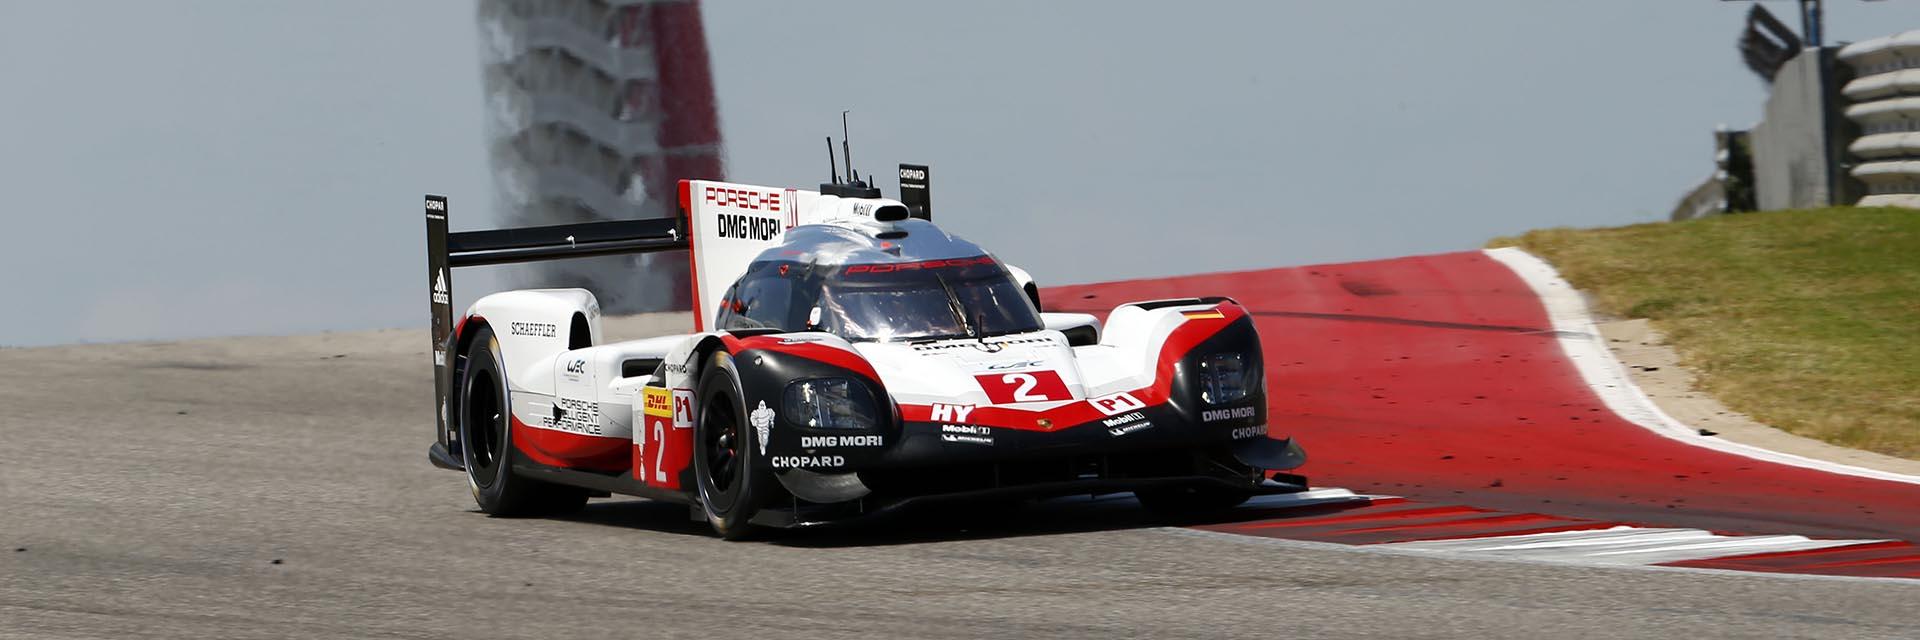 Porsche FIA WEC COTA